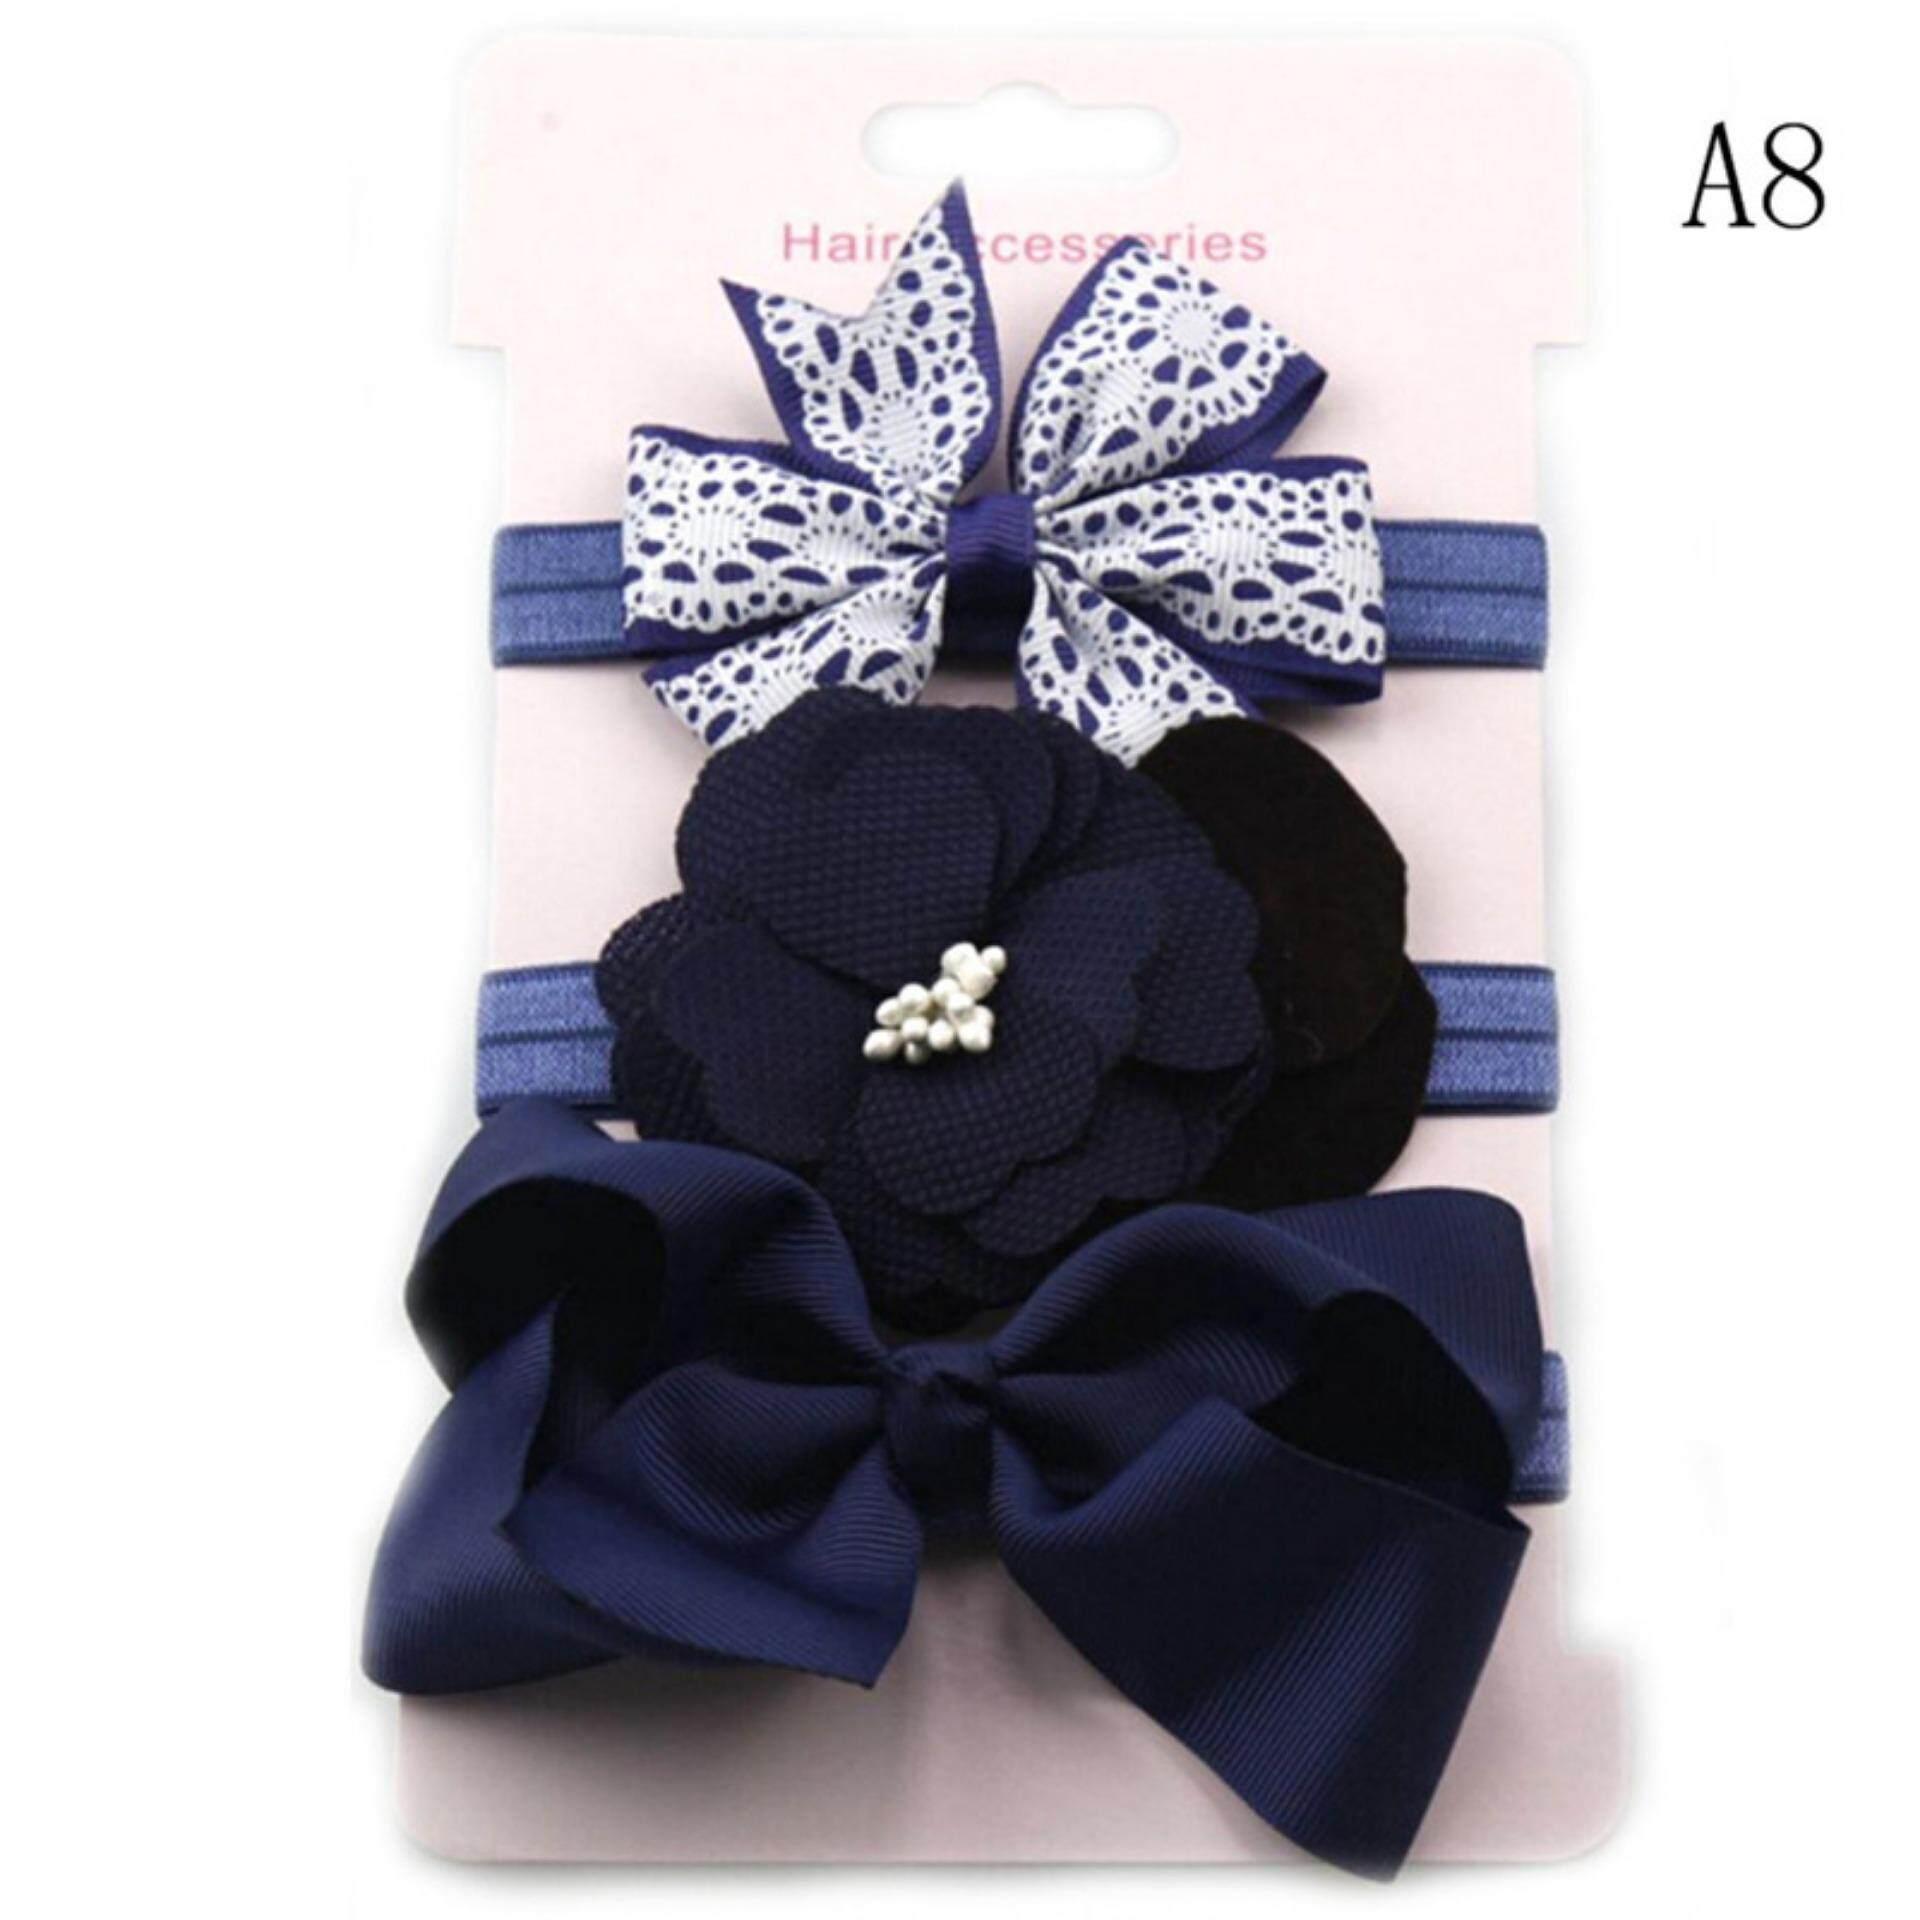 3pcs/set Newborn Girl Bow Headband Ribbon Elastic Baby Headdress Kids Hair Band Type:a8 By Dragon Store.